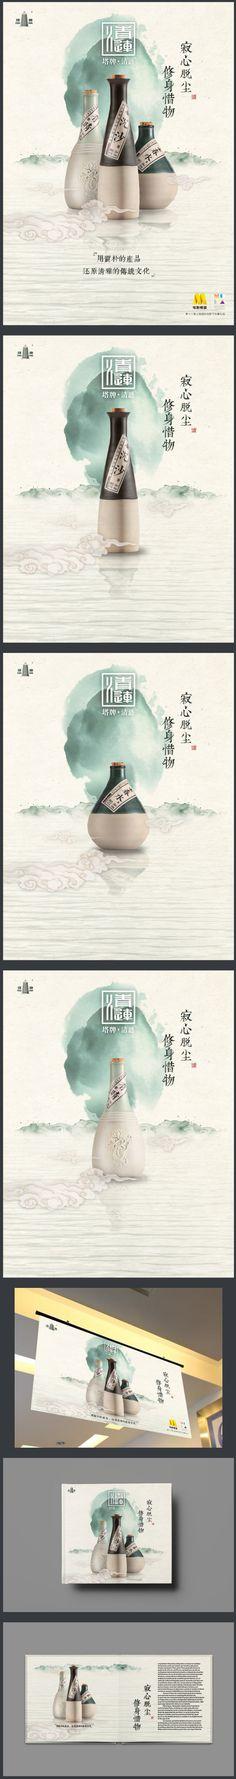 Chinese Design, Japanese Graphic Design, Asian Design, Chinese Style, Web Design, Love Design, Layout Design, Design Art, Print Design